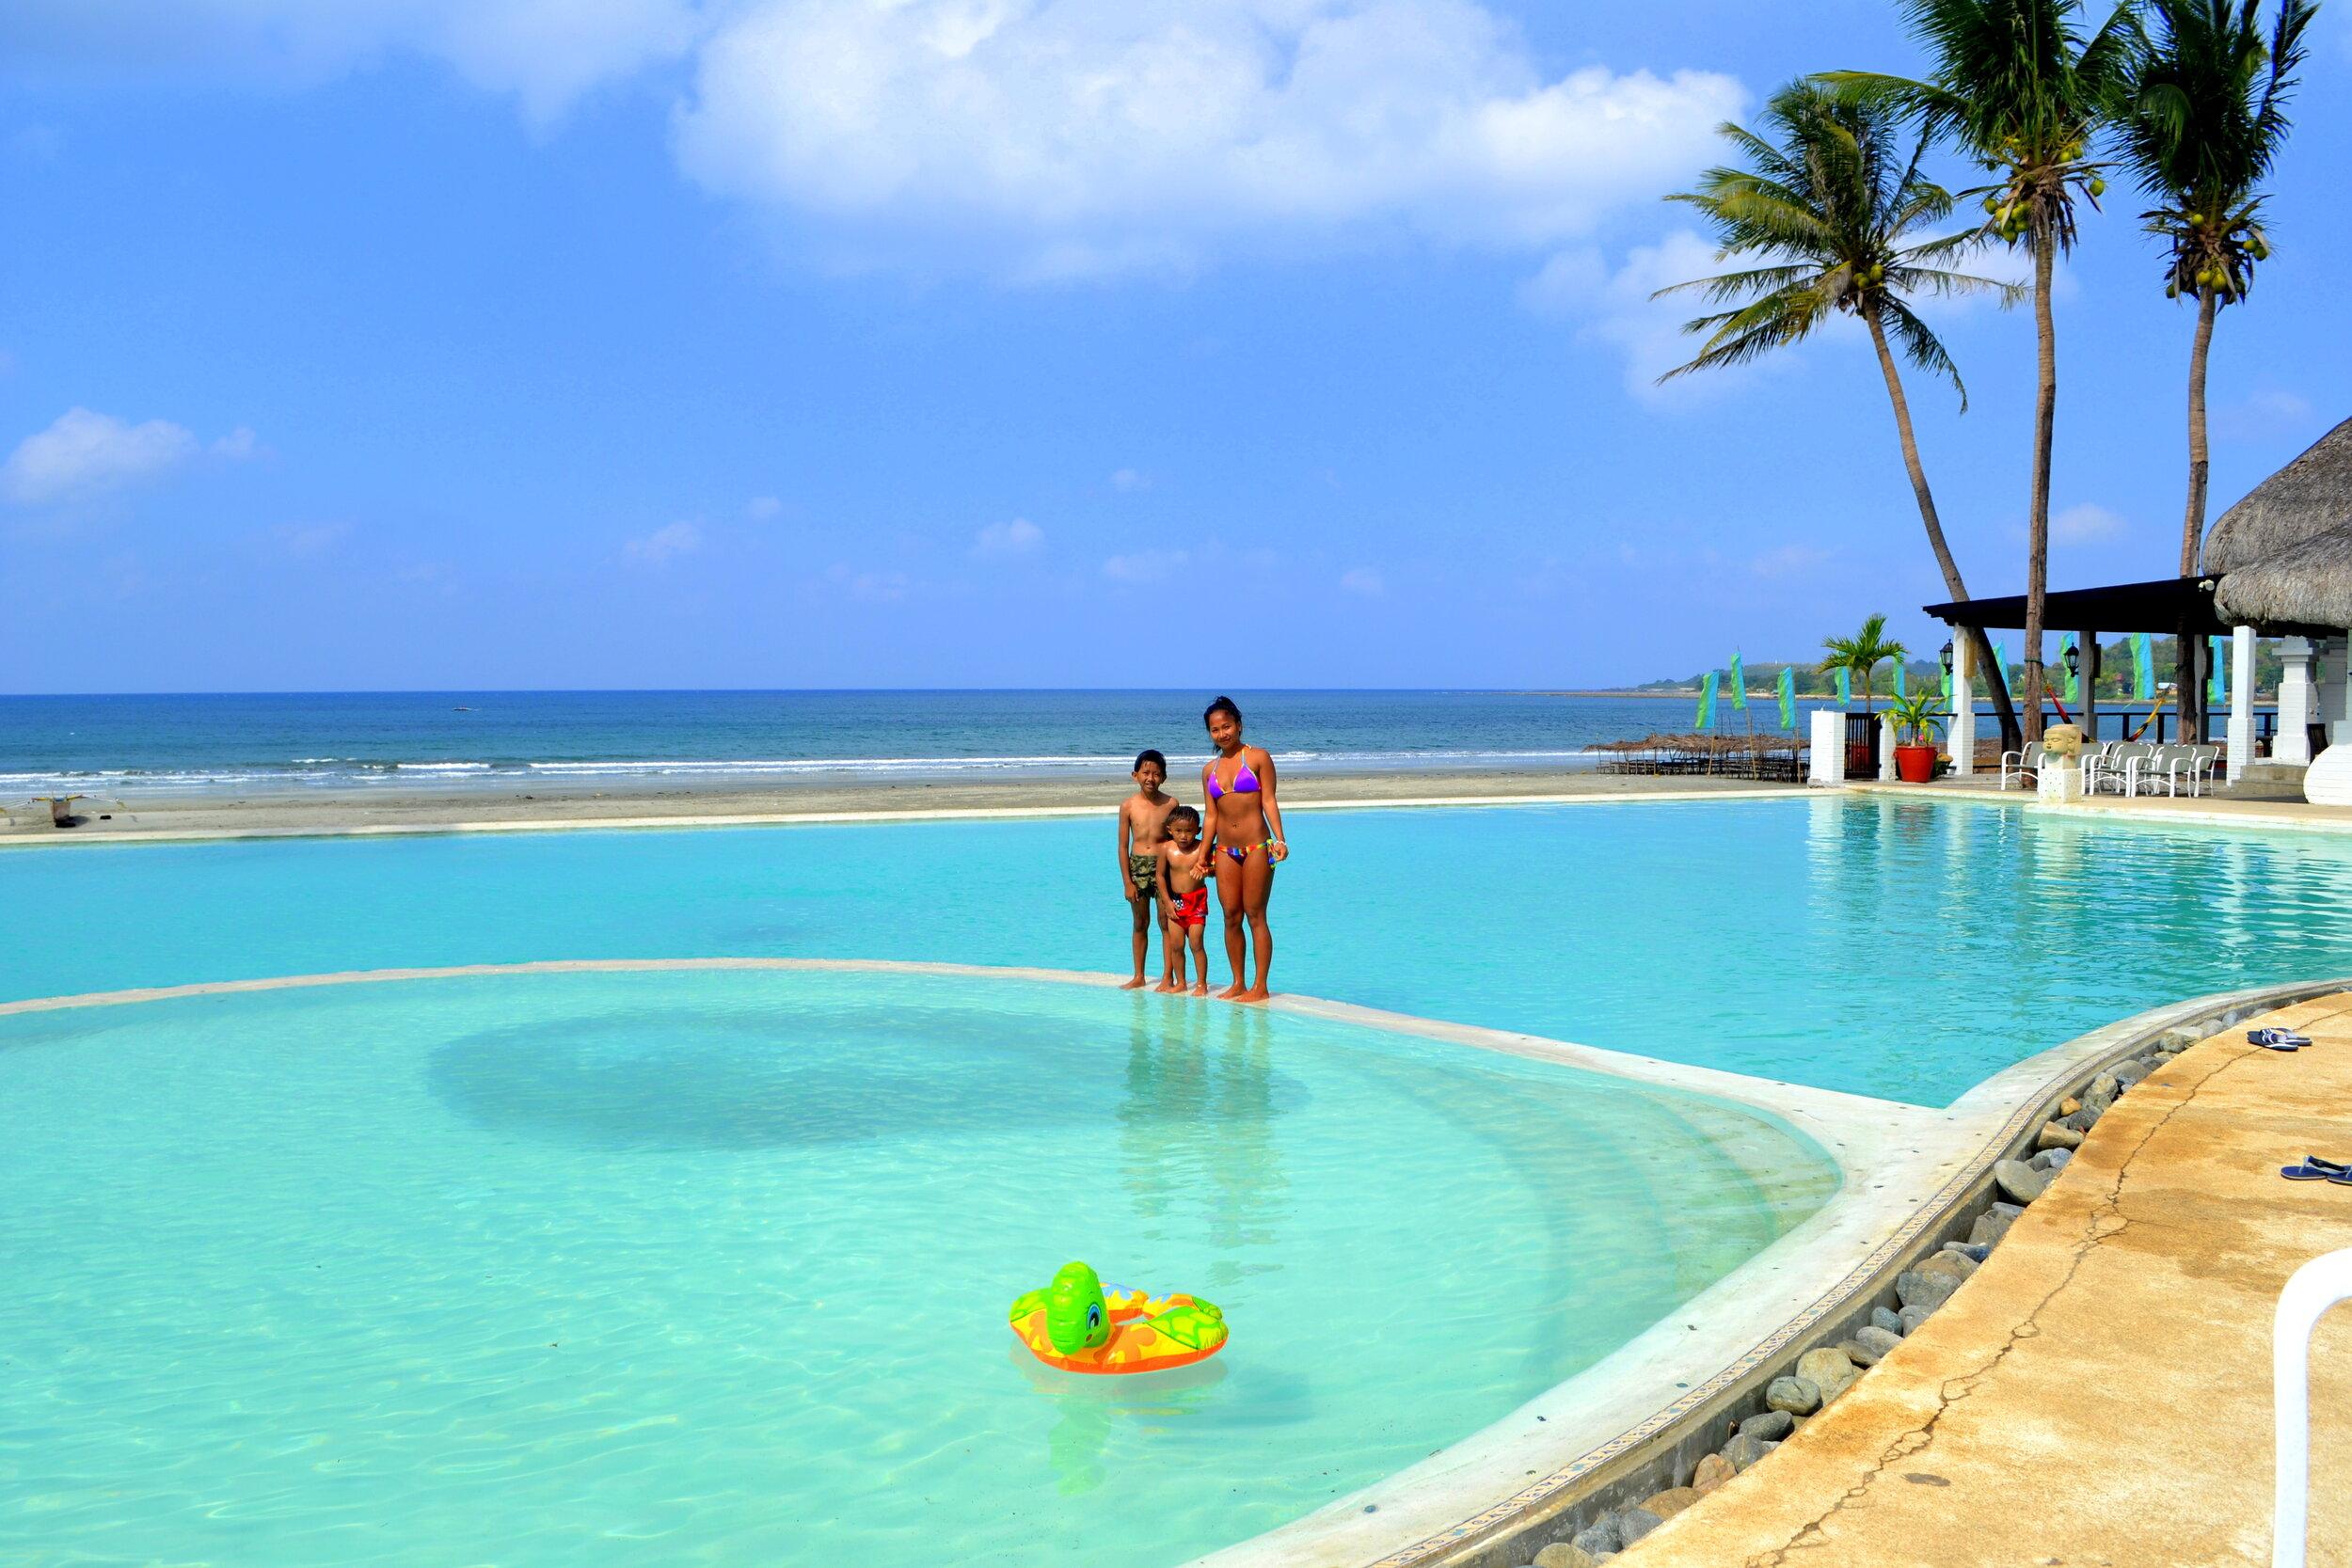 Top Beach Resorts In Ilocos Norte